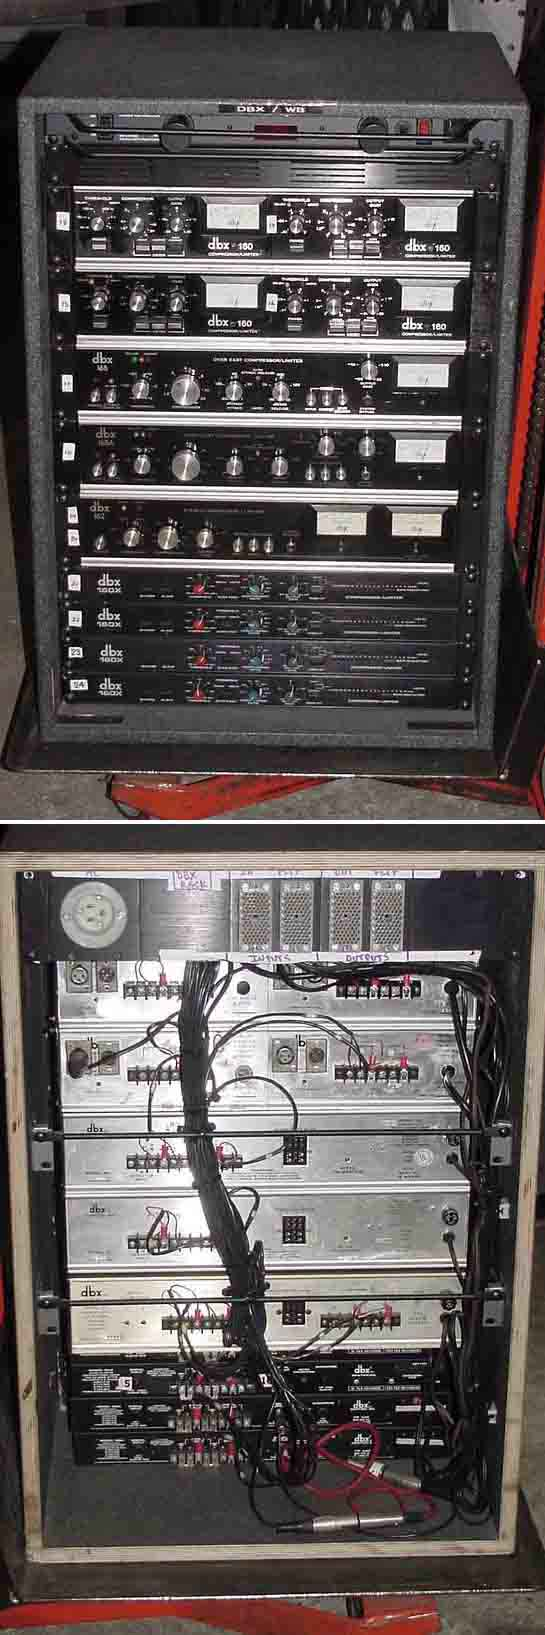 Steve Wiring Racks And Organization Gearslutz Basic Electrical About Dbx